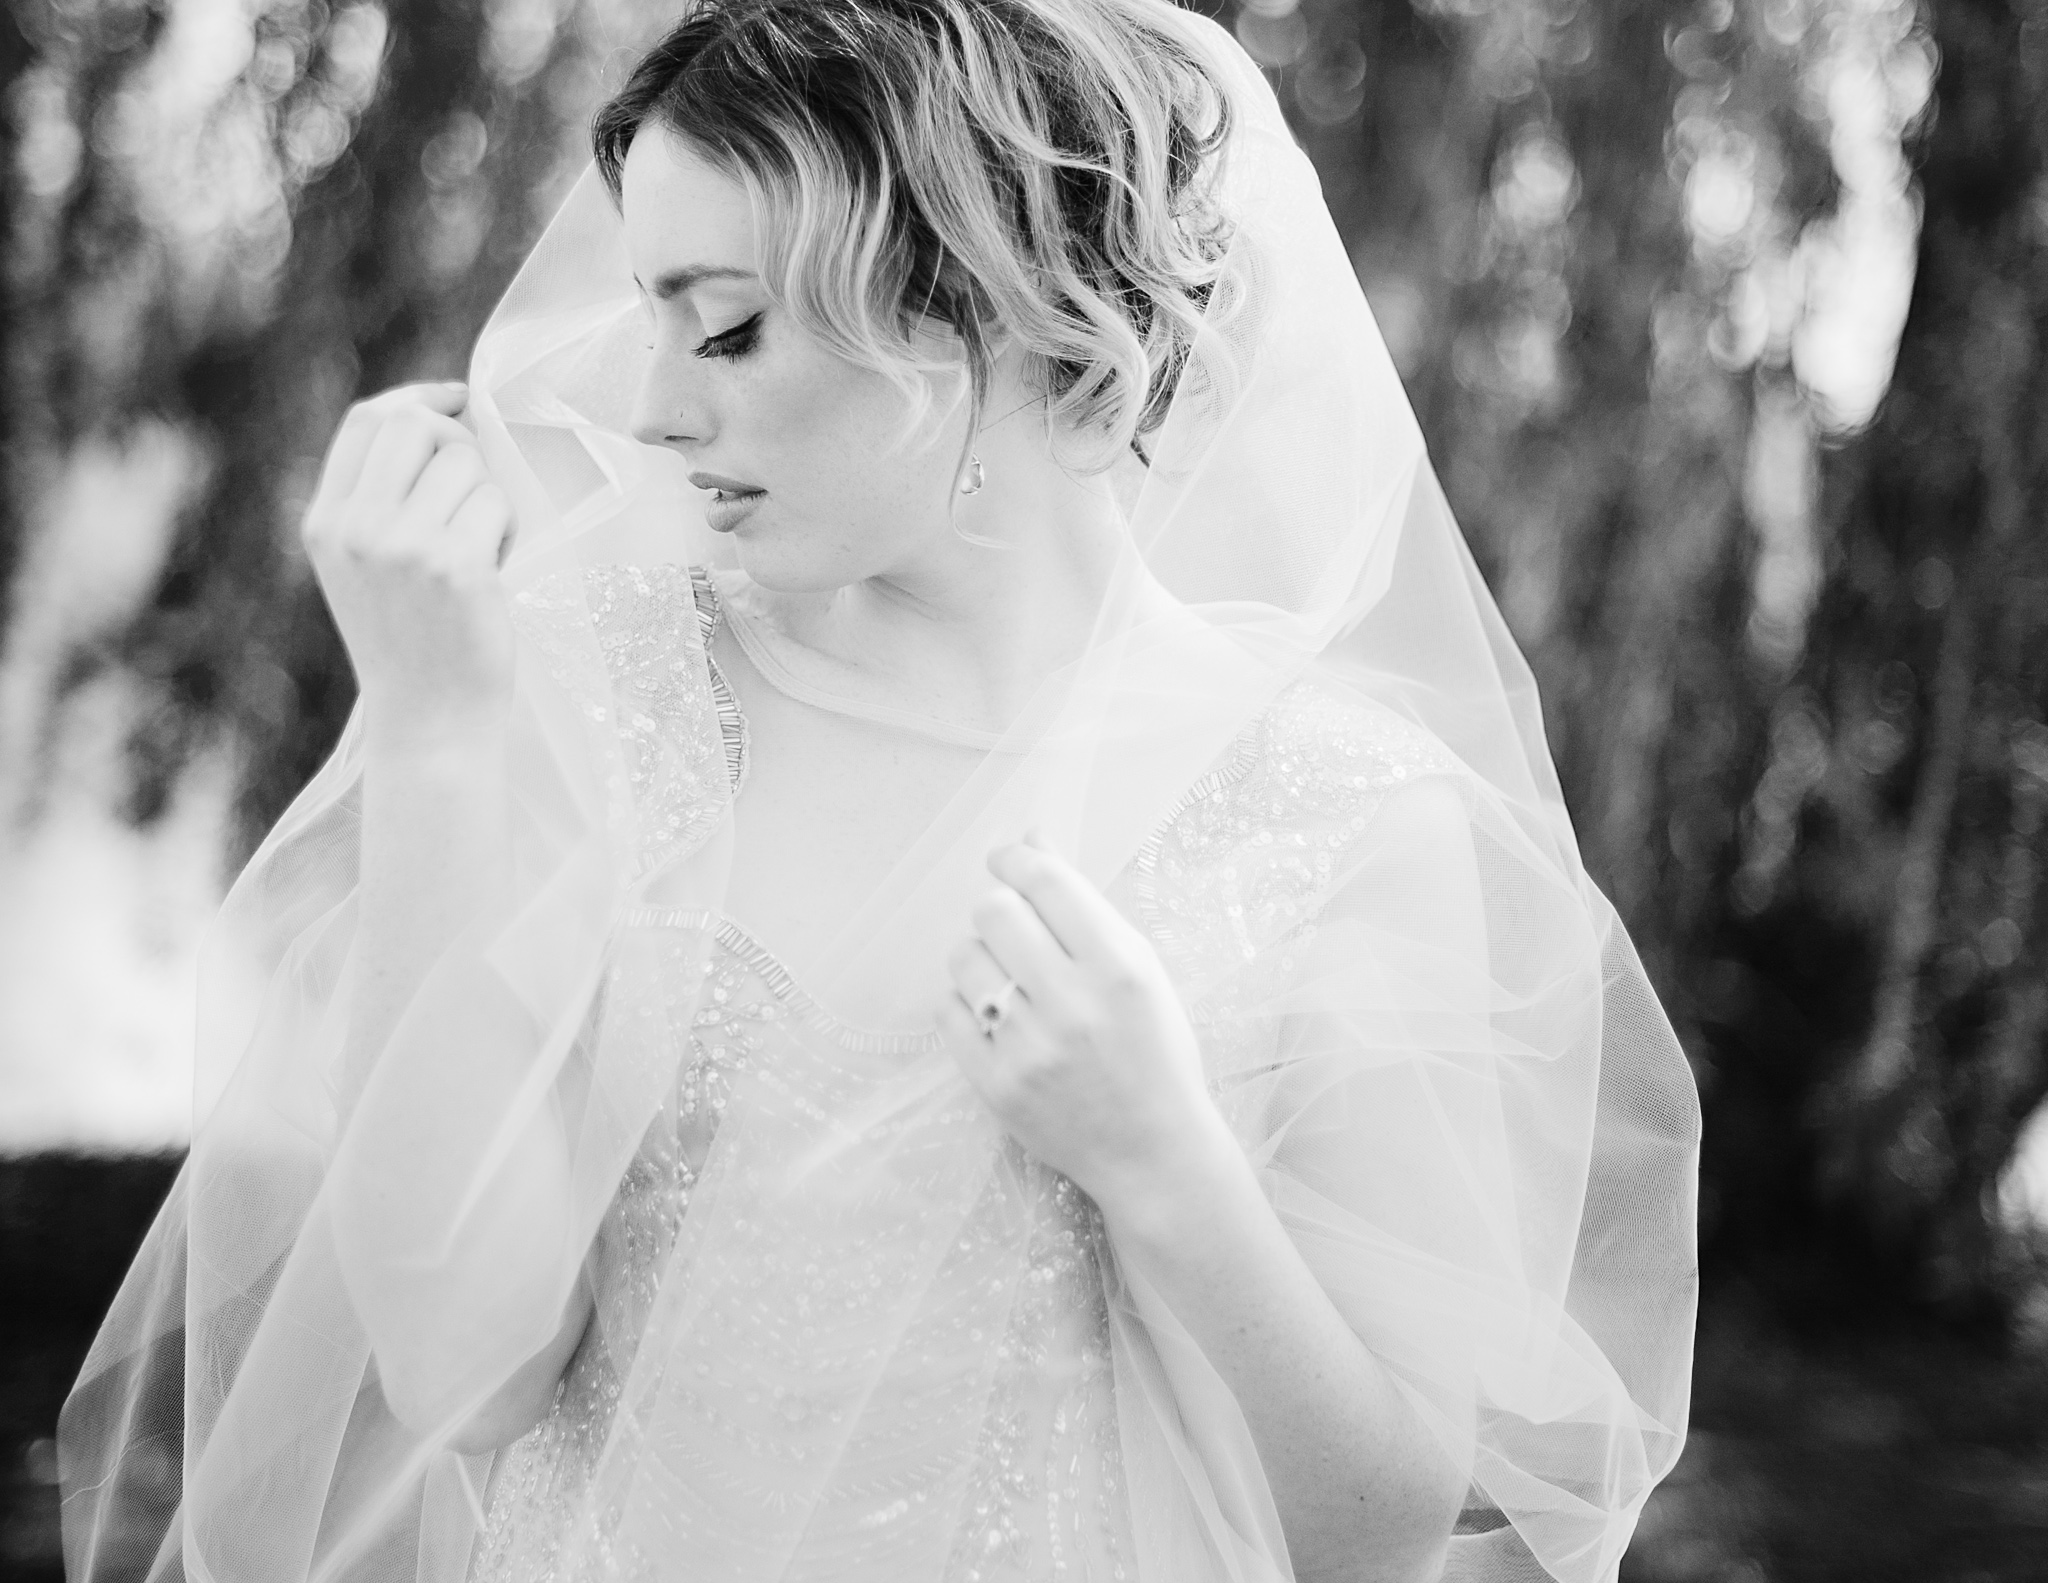 virginiawedding_bridalphotos_charlottesvillewedding_youseephotography_TrumpWinery (82).jpg